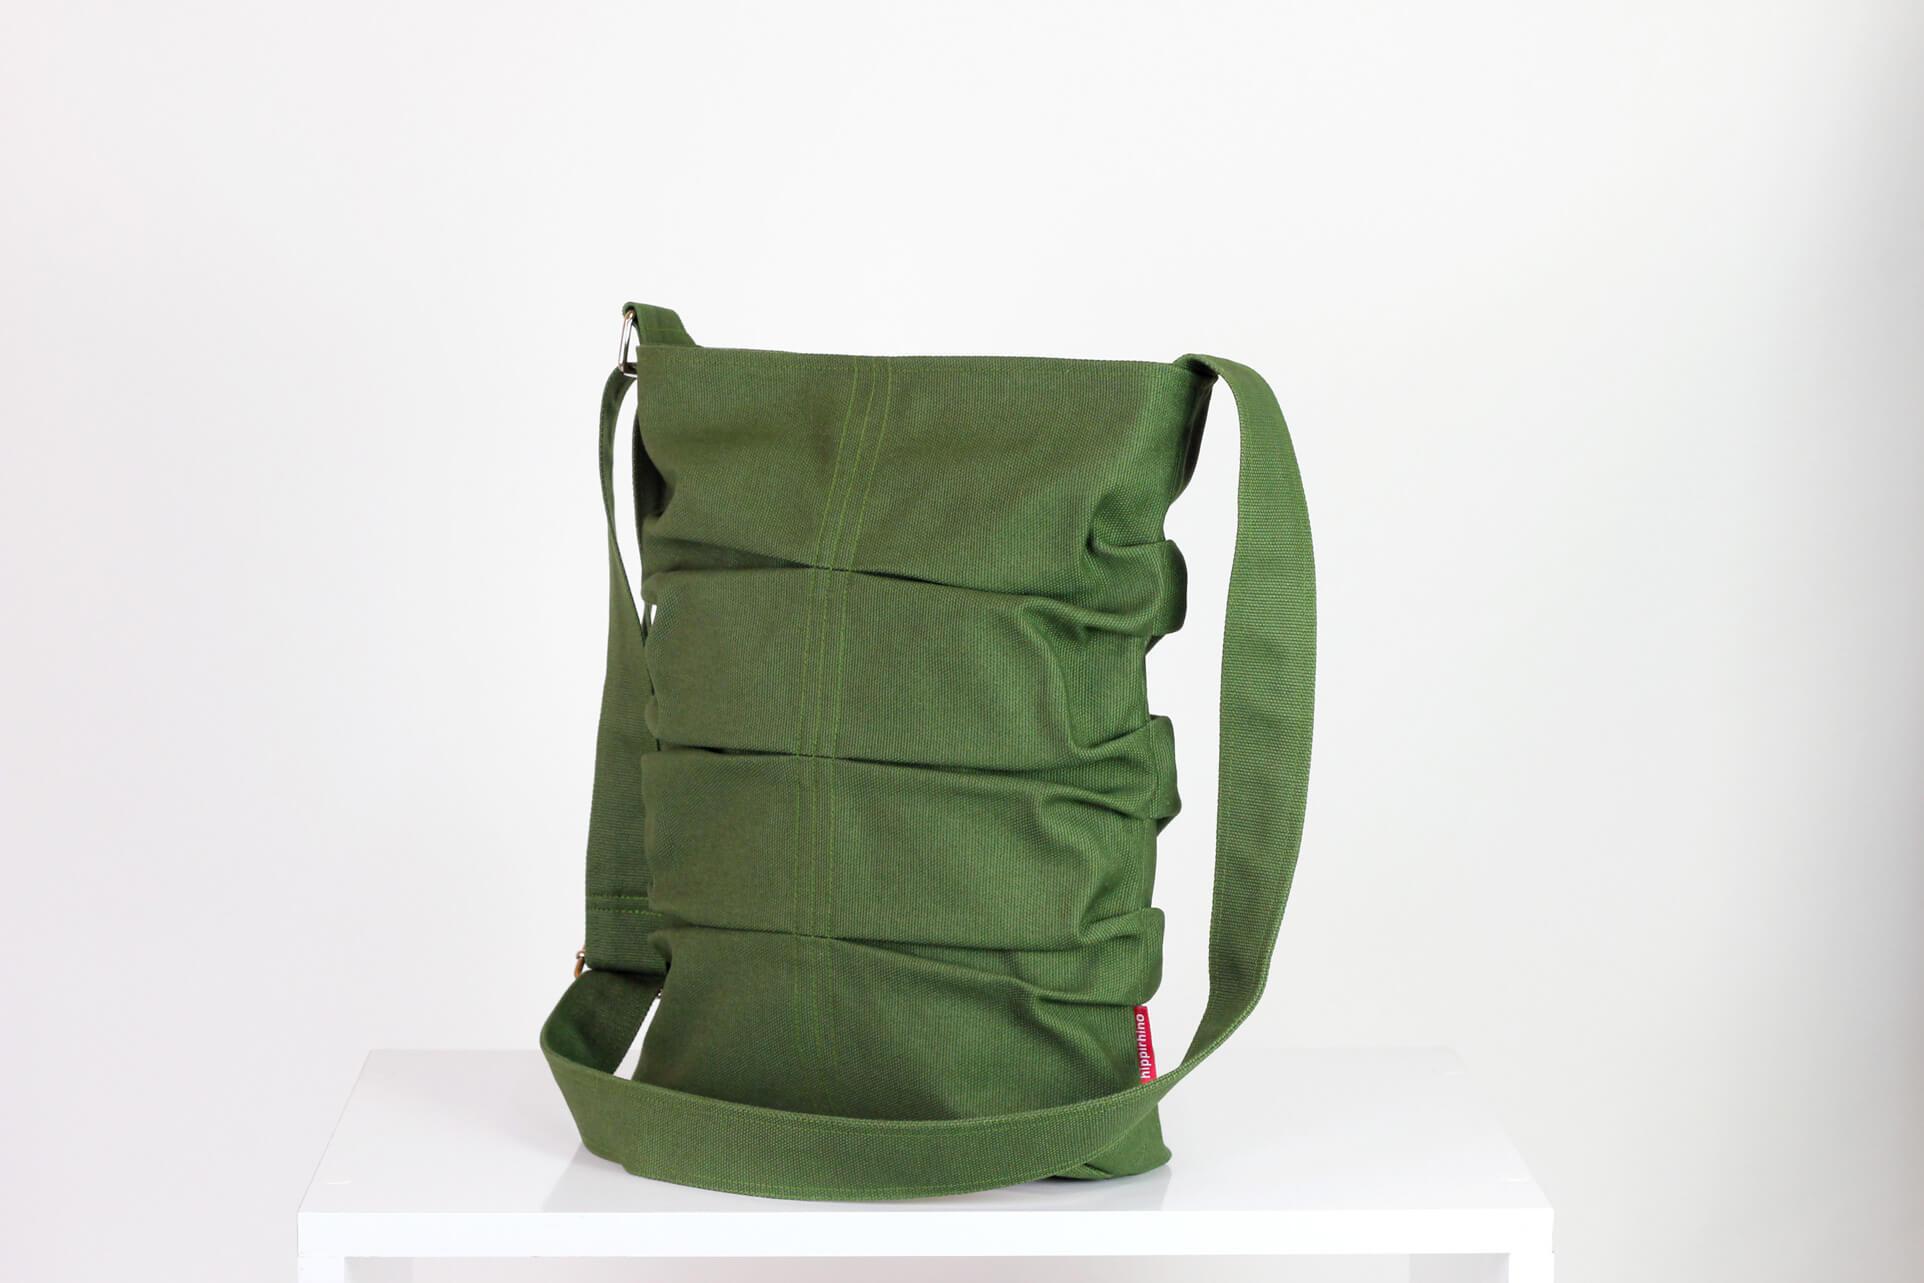 6e9b3eeaf2 Green Small Canvas Tote Bag